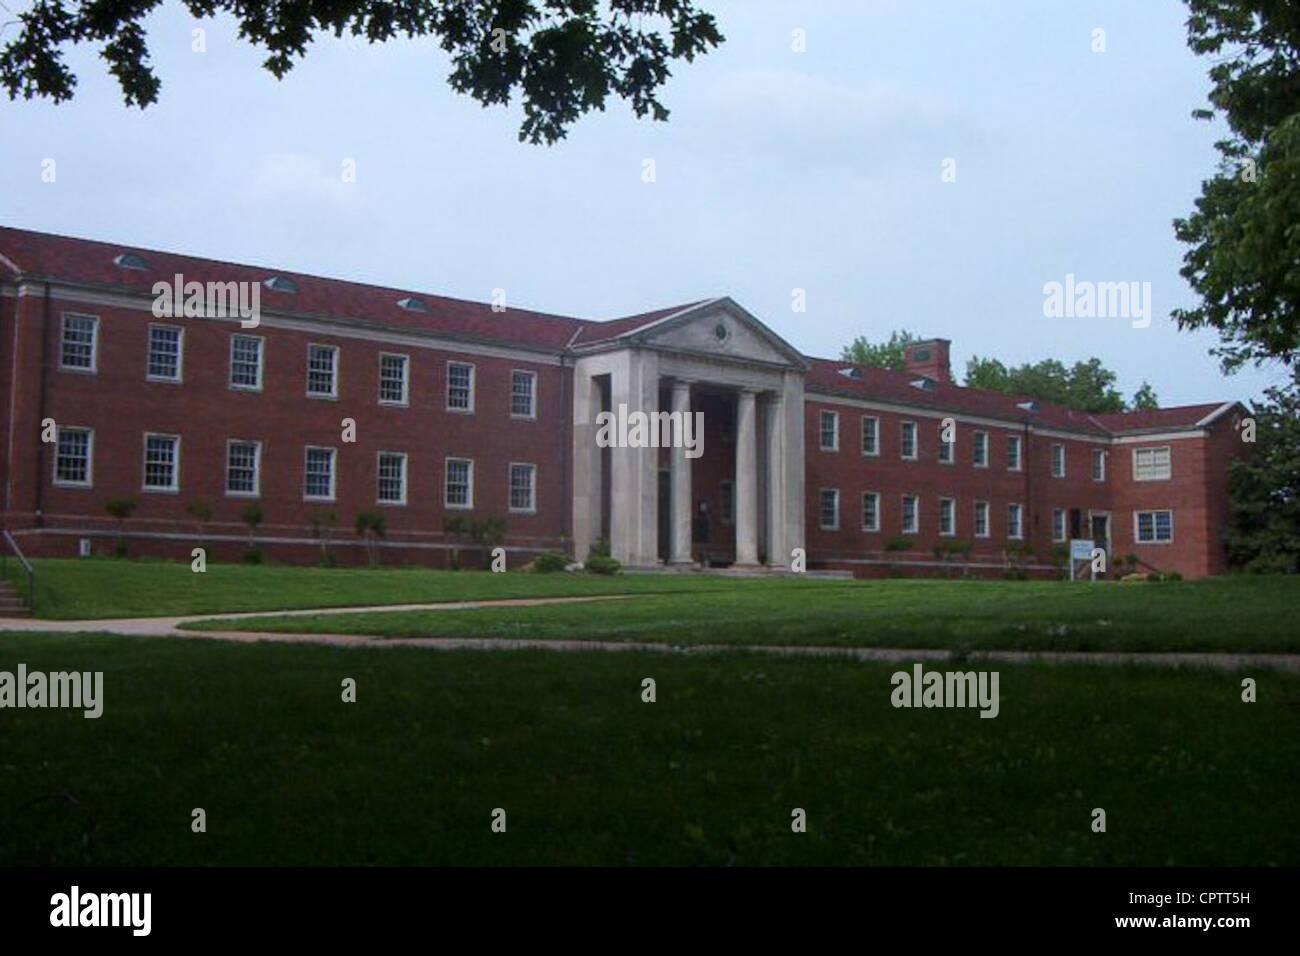 Hall-Moody Administration Building, UT Martin. - Stock Image